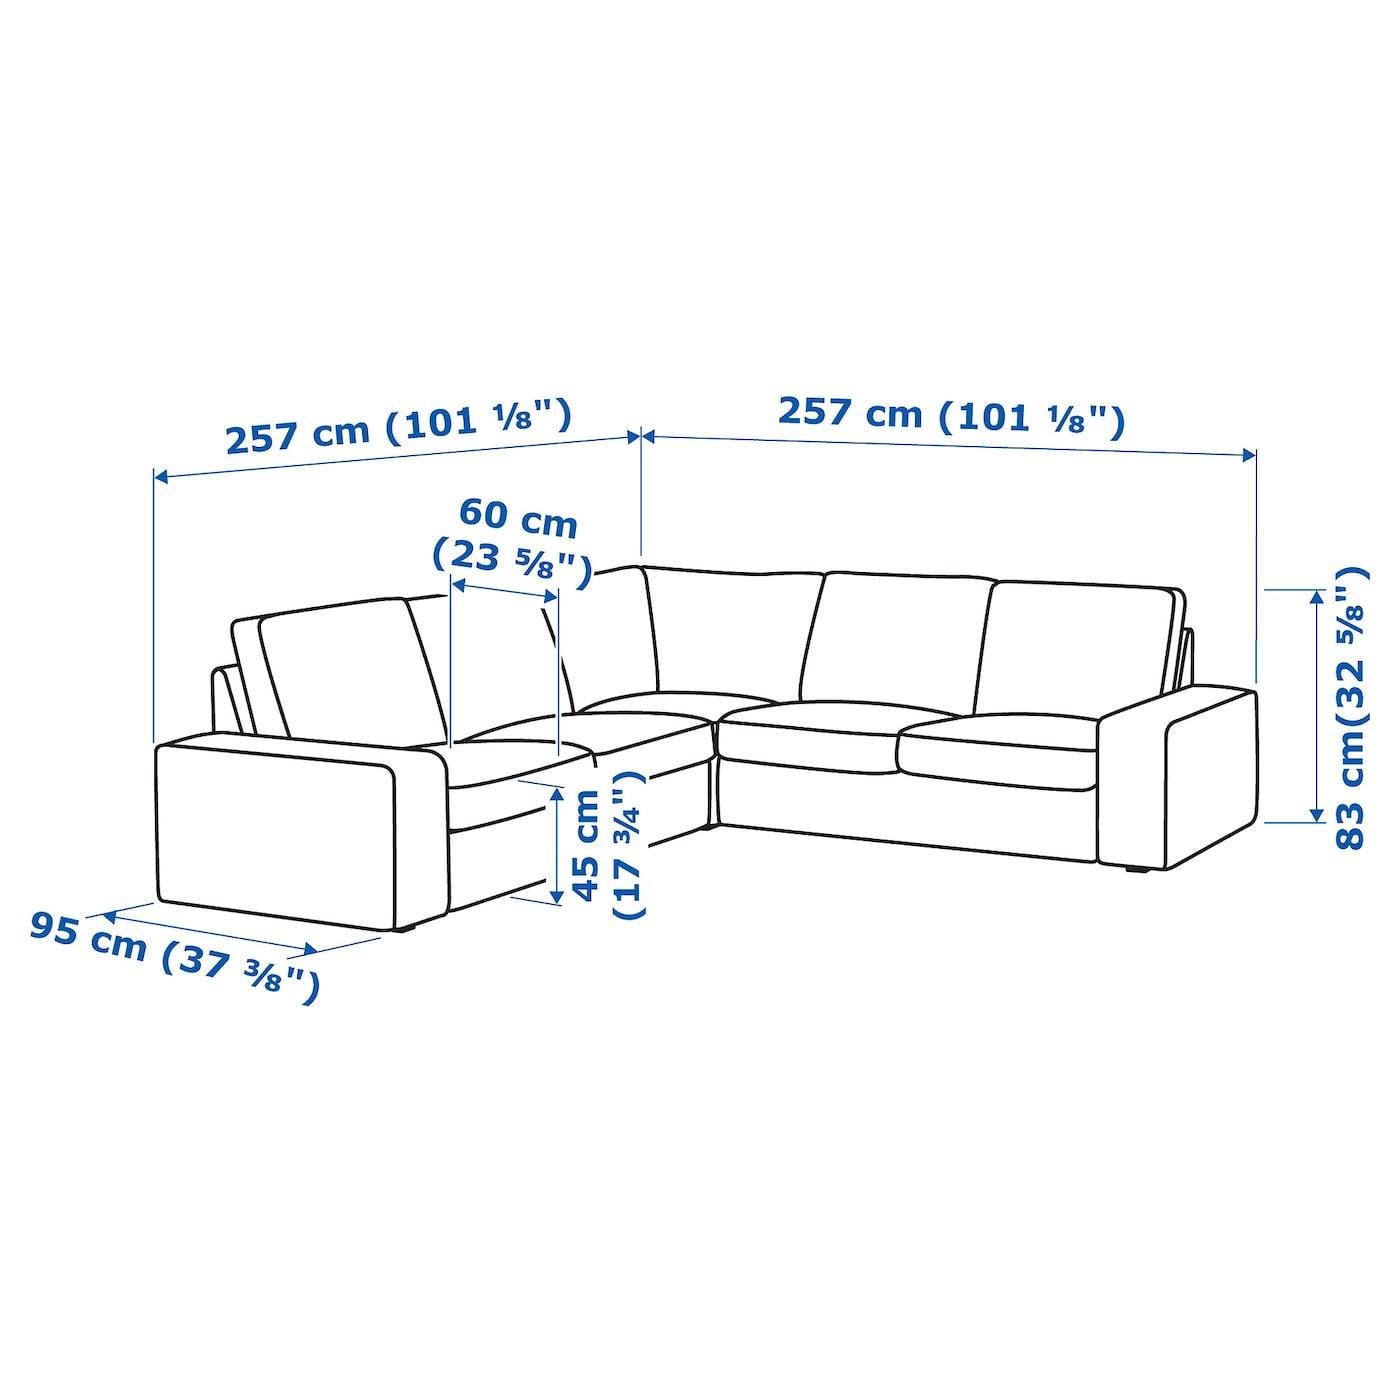 Kivik Canapé D'Angle, 4 Places - Hillared Beige serapportantà Canapé D'Angle 8 10 Places Ikea